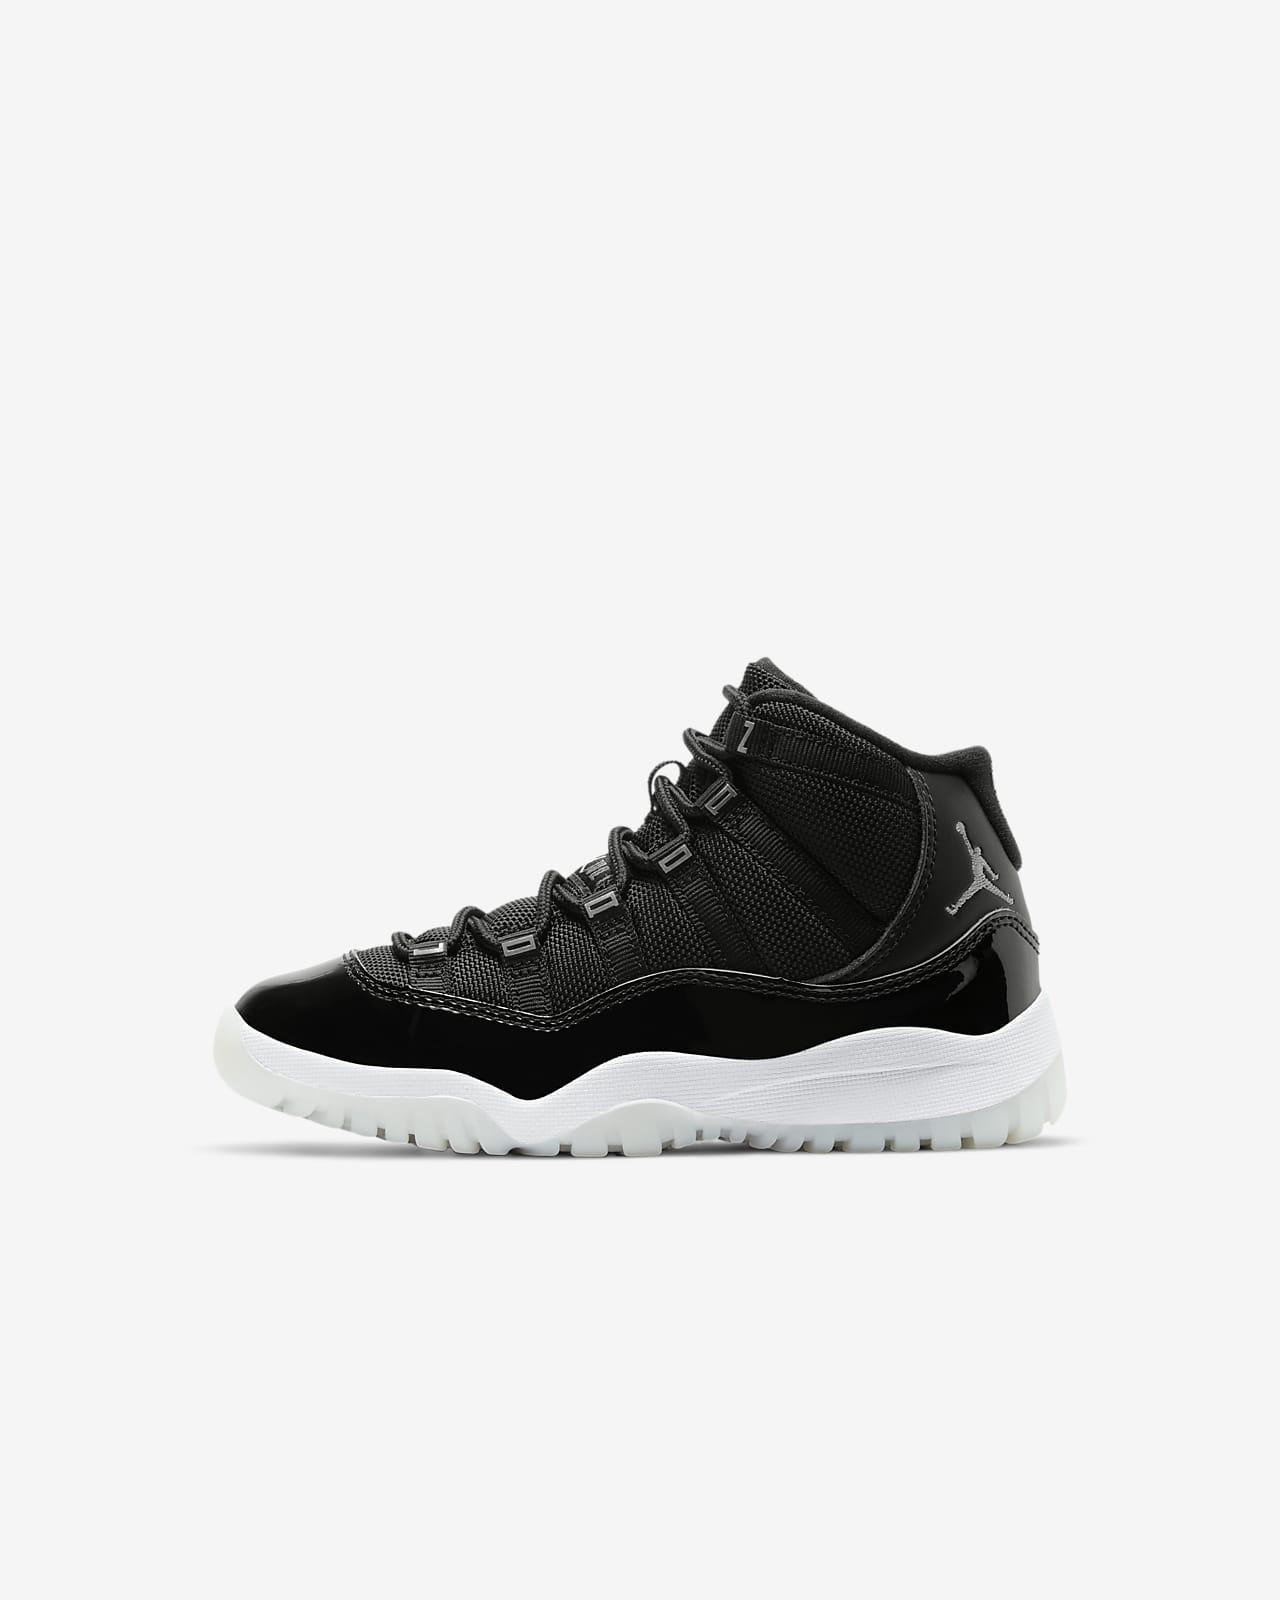 Jordan 11 Retro (PS)复刻幼童运动童鞋